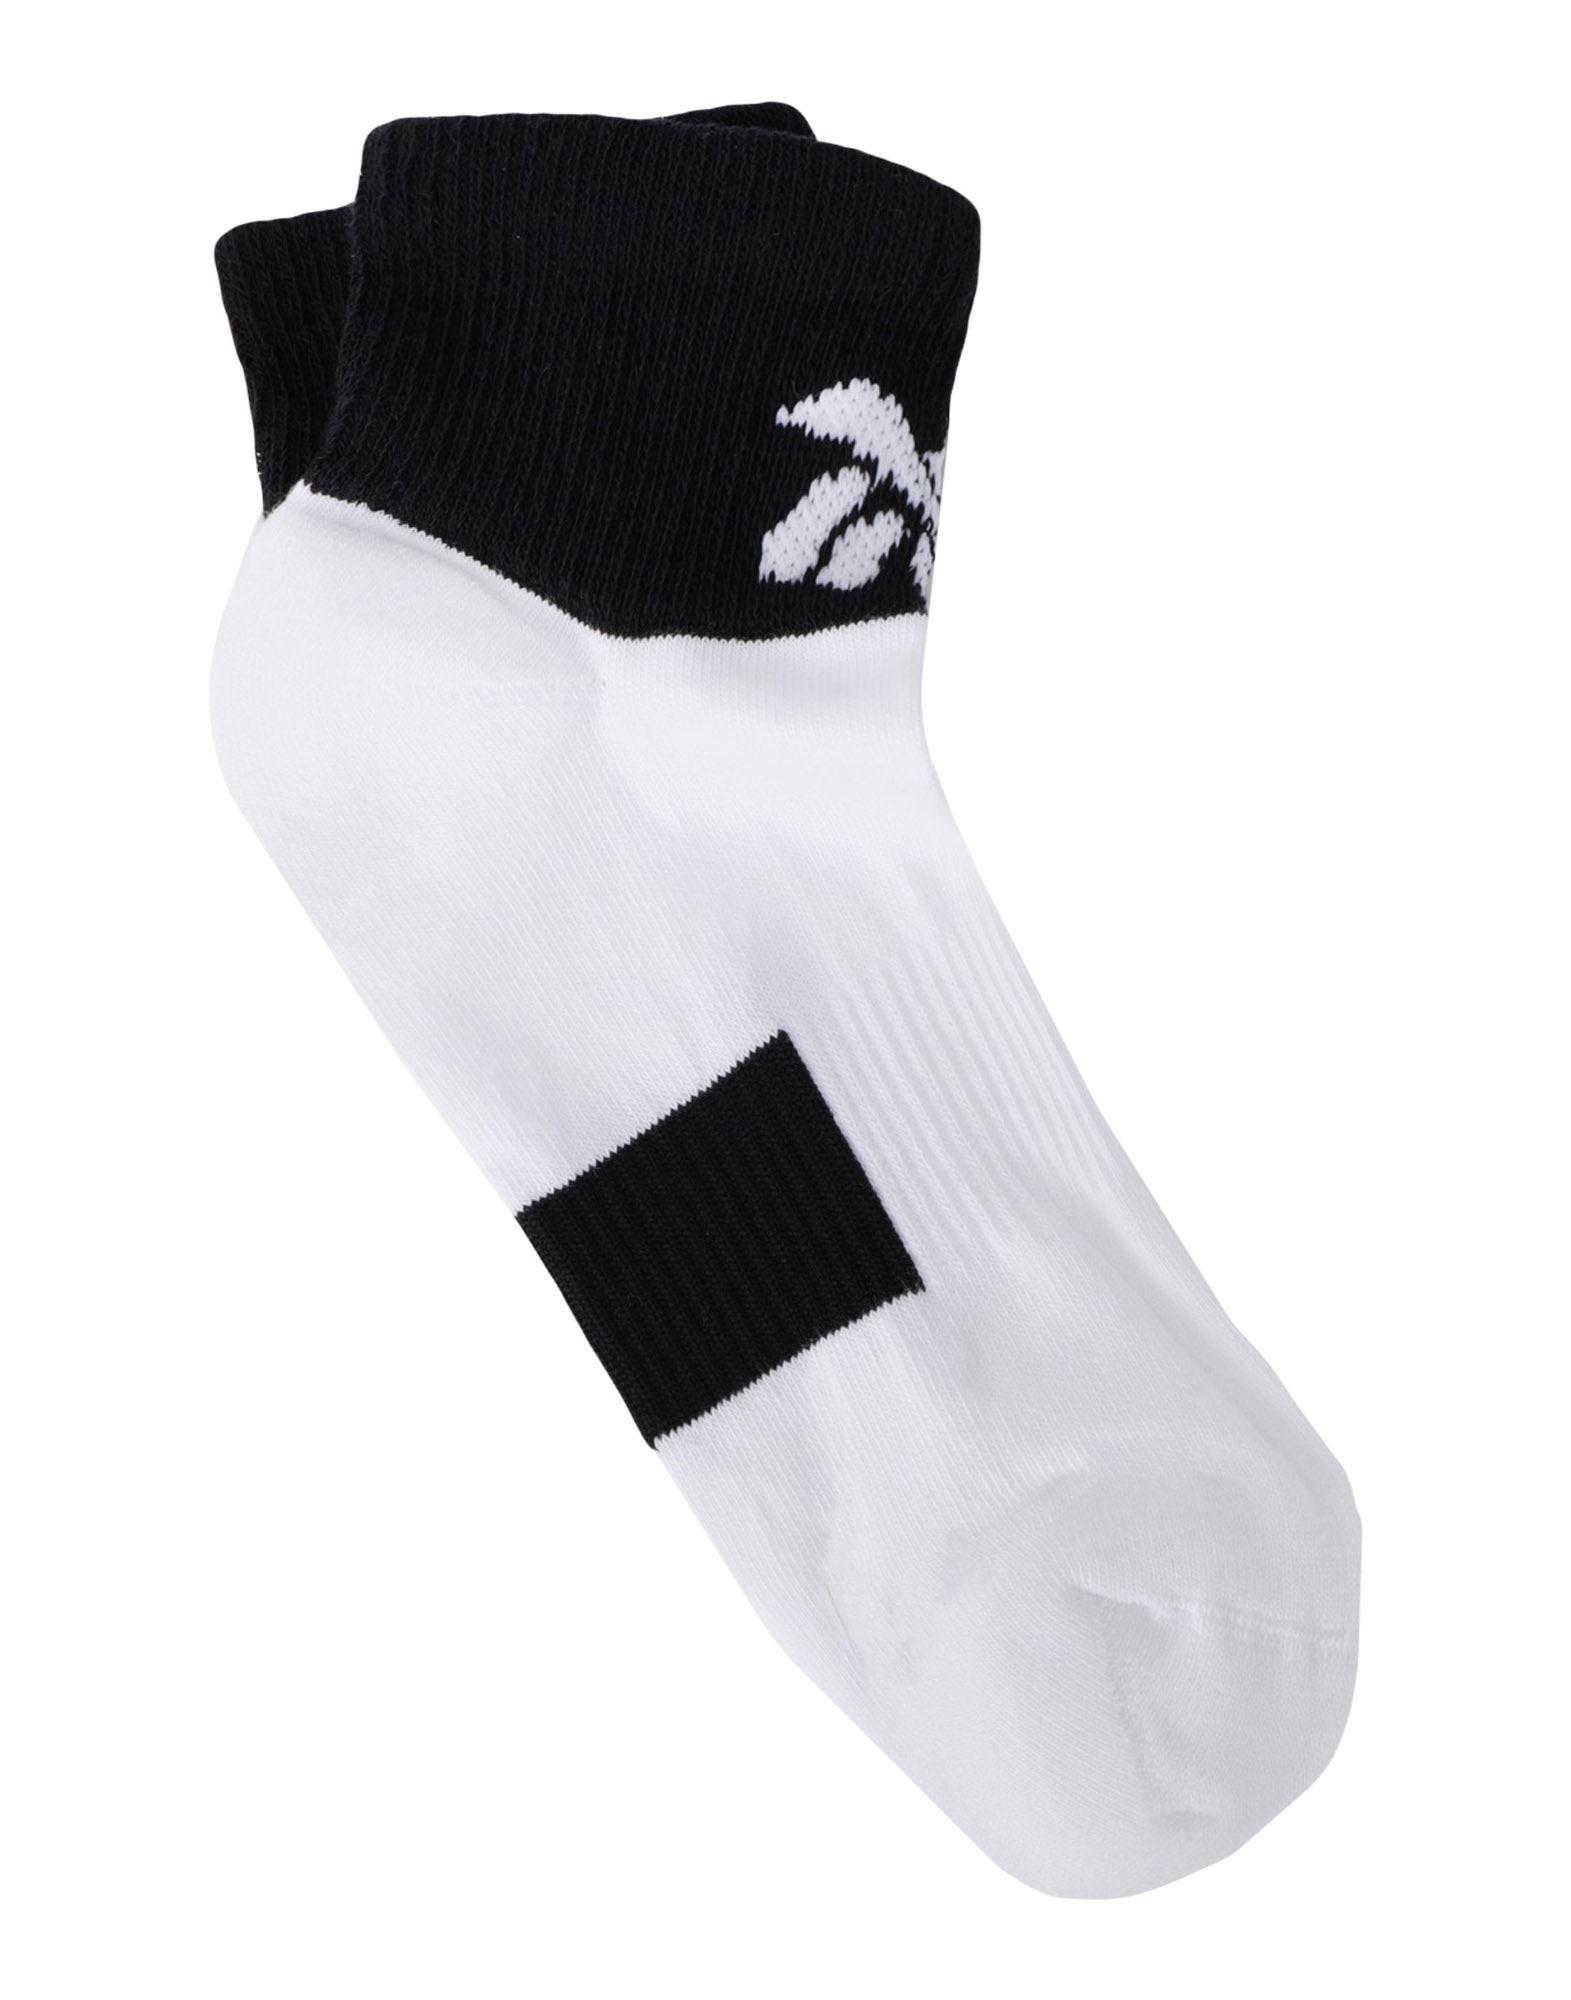 носки reebok act fon inside sock 3p цвет белый du2987 размер 47 49 REEBOK x VICTORIA BECKHAM Короткие носки